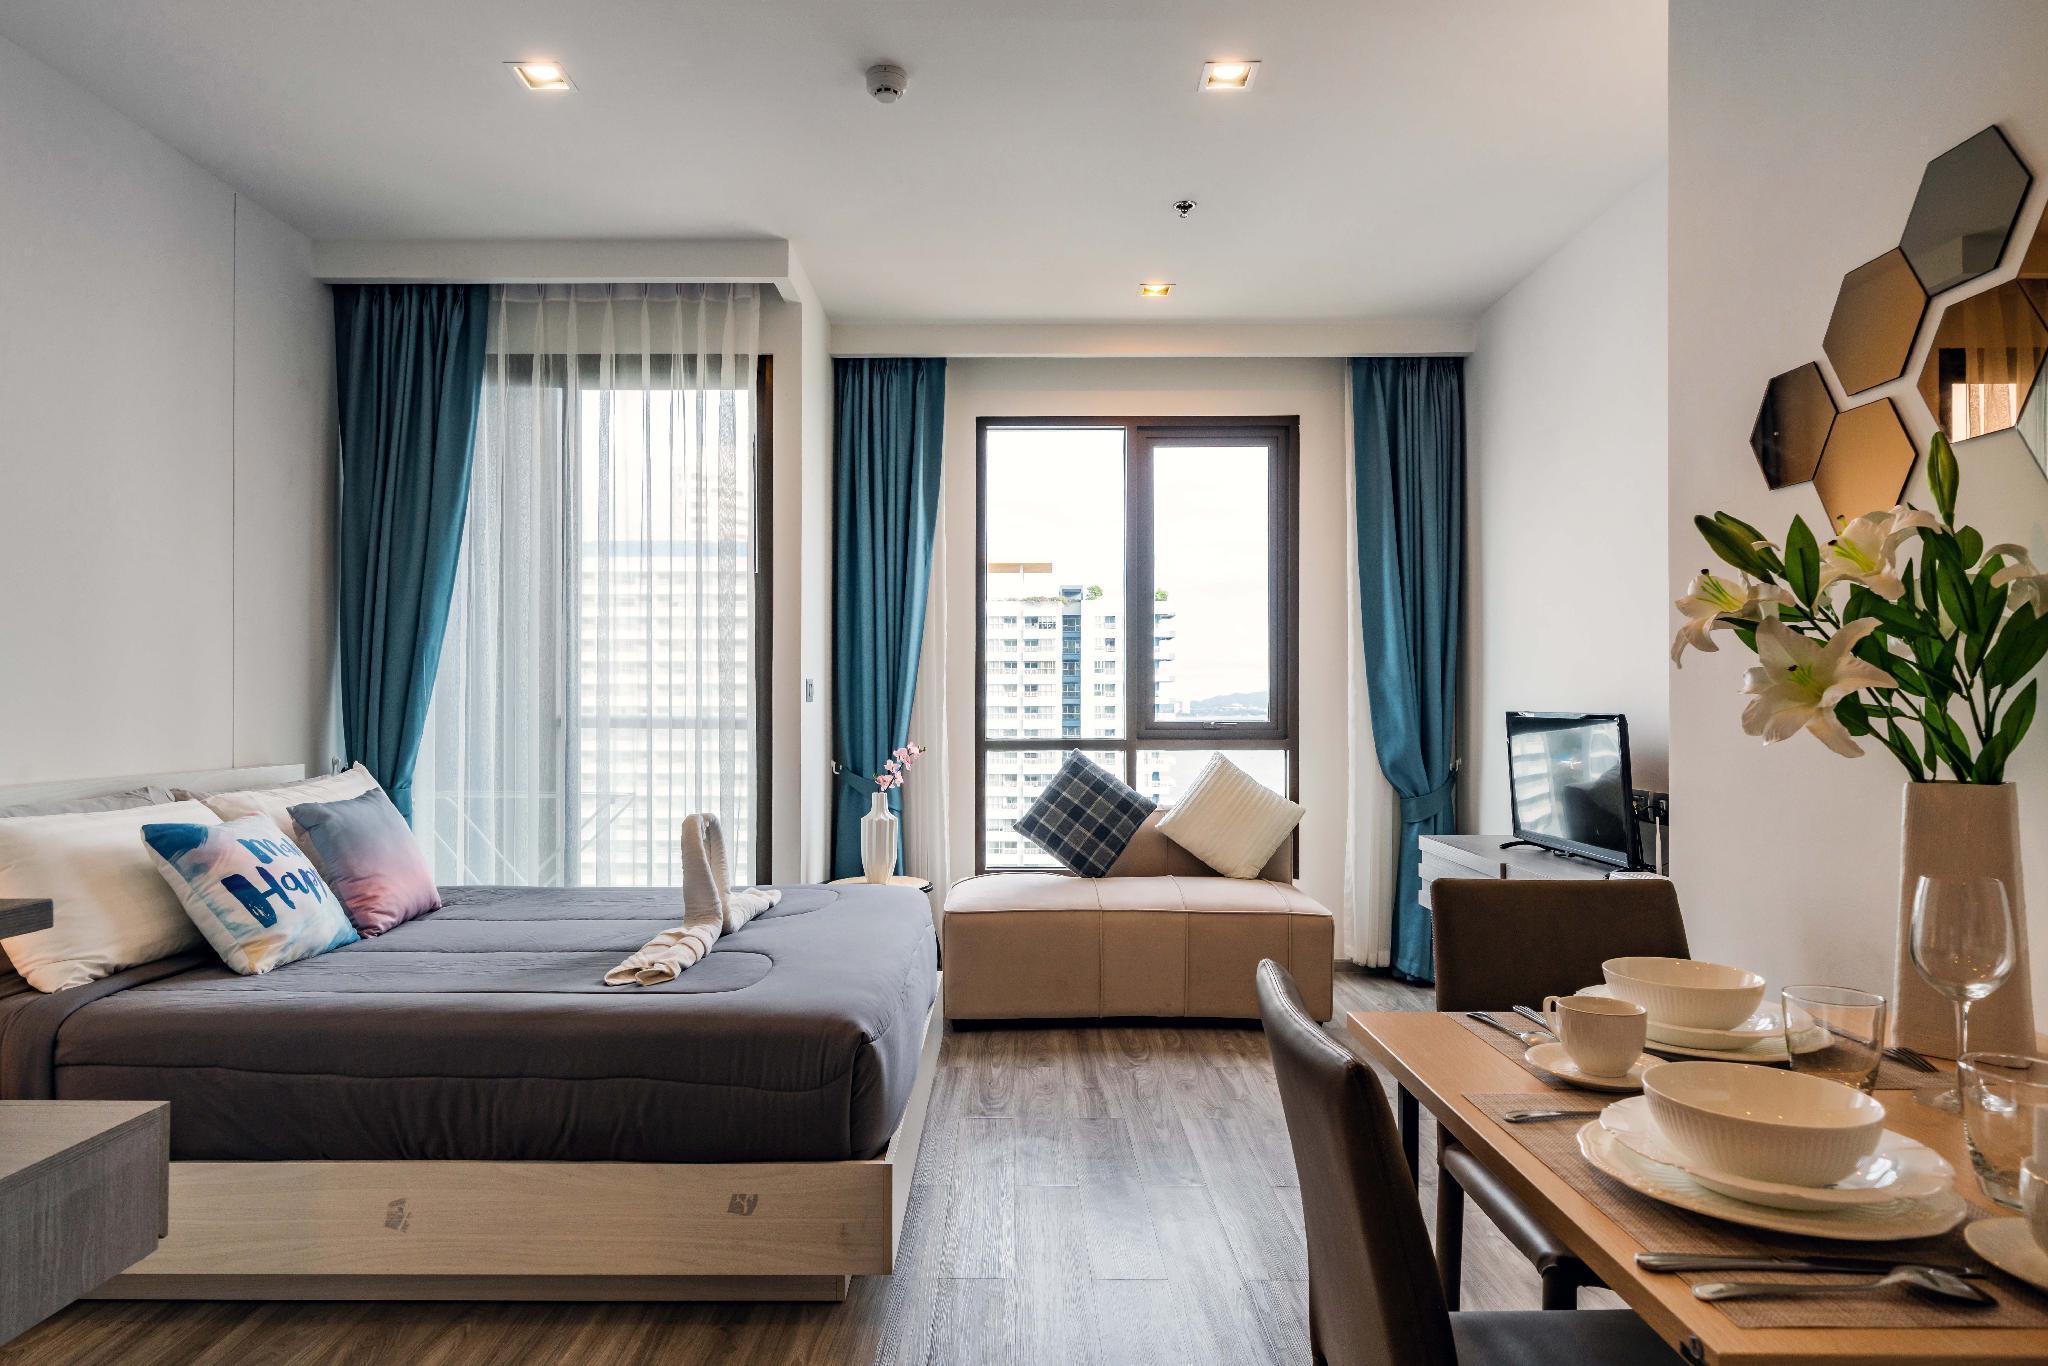 Pattaya Aeras Condo studio room 50 meters to beach อพาร์ตเมนต์ 1 ห้องนอน 1 ห้องน้ำส่วนตัว ขนาด 27 ตร.ม. – หาดจอมเทียน